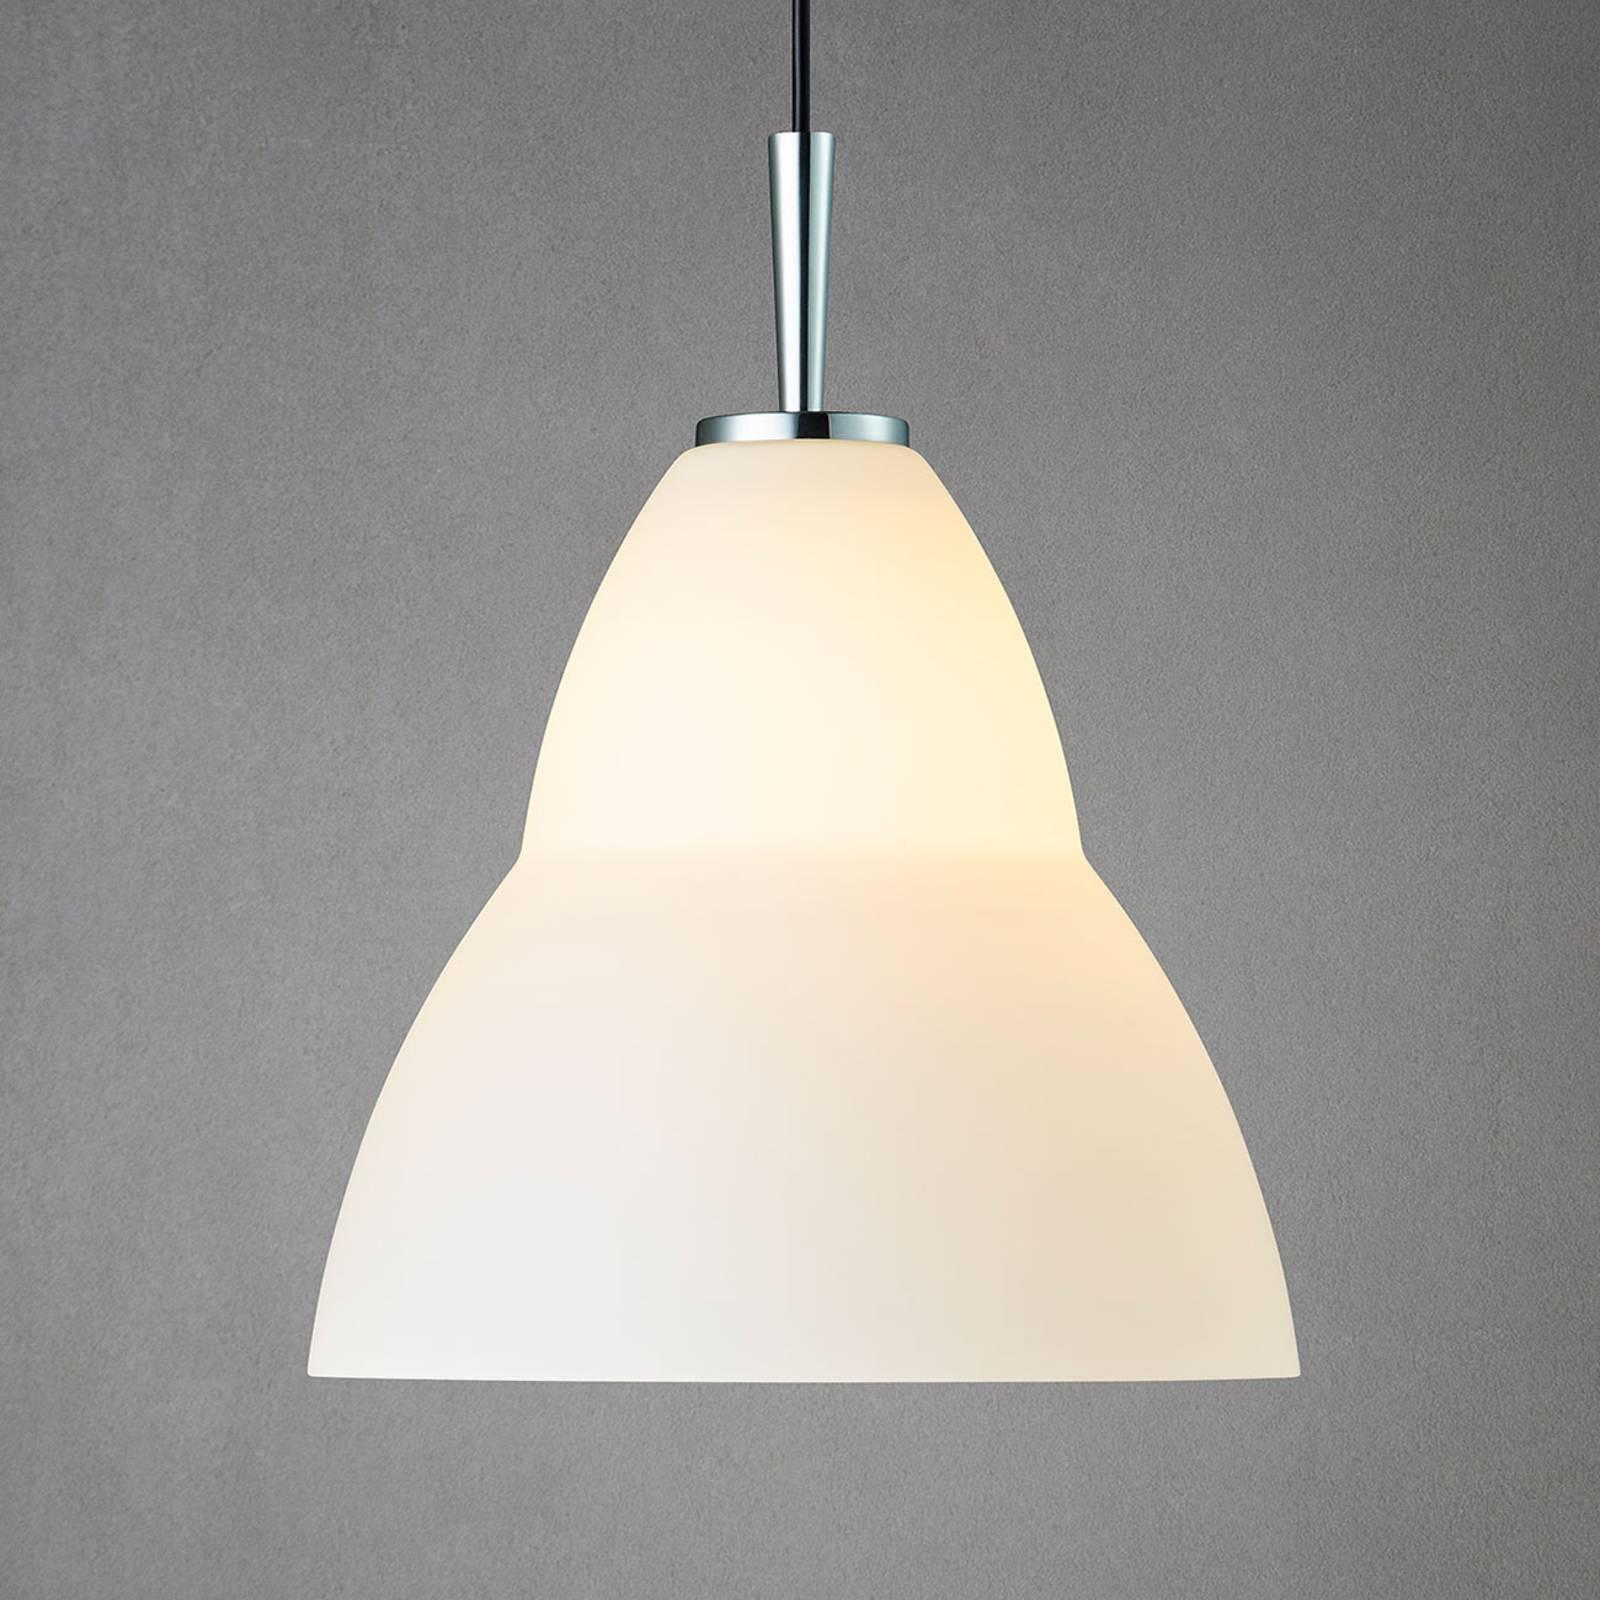 Lampada a sospensione in vetro Fico L, Ø 35 cm